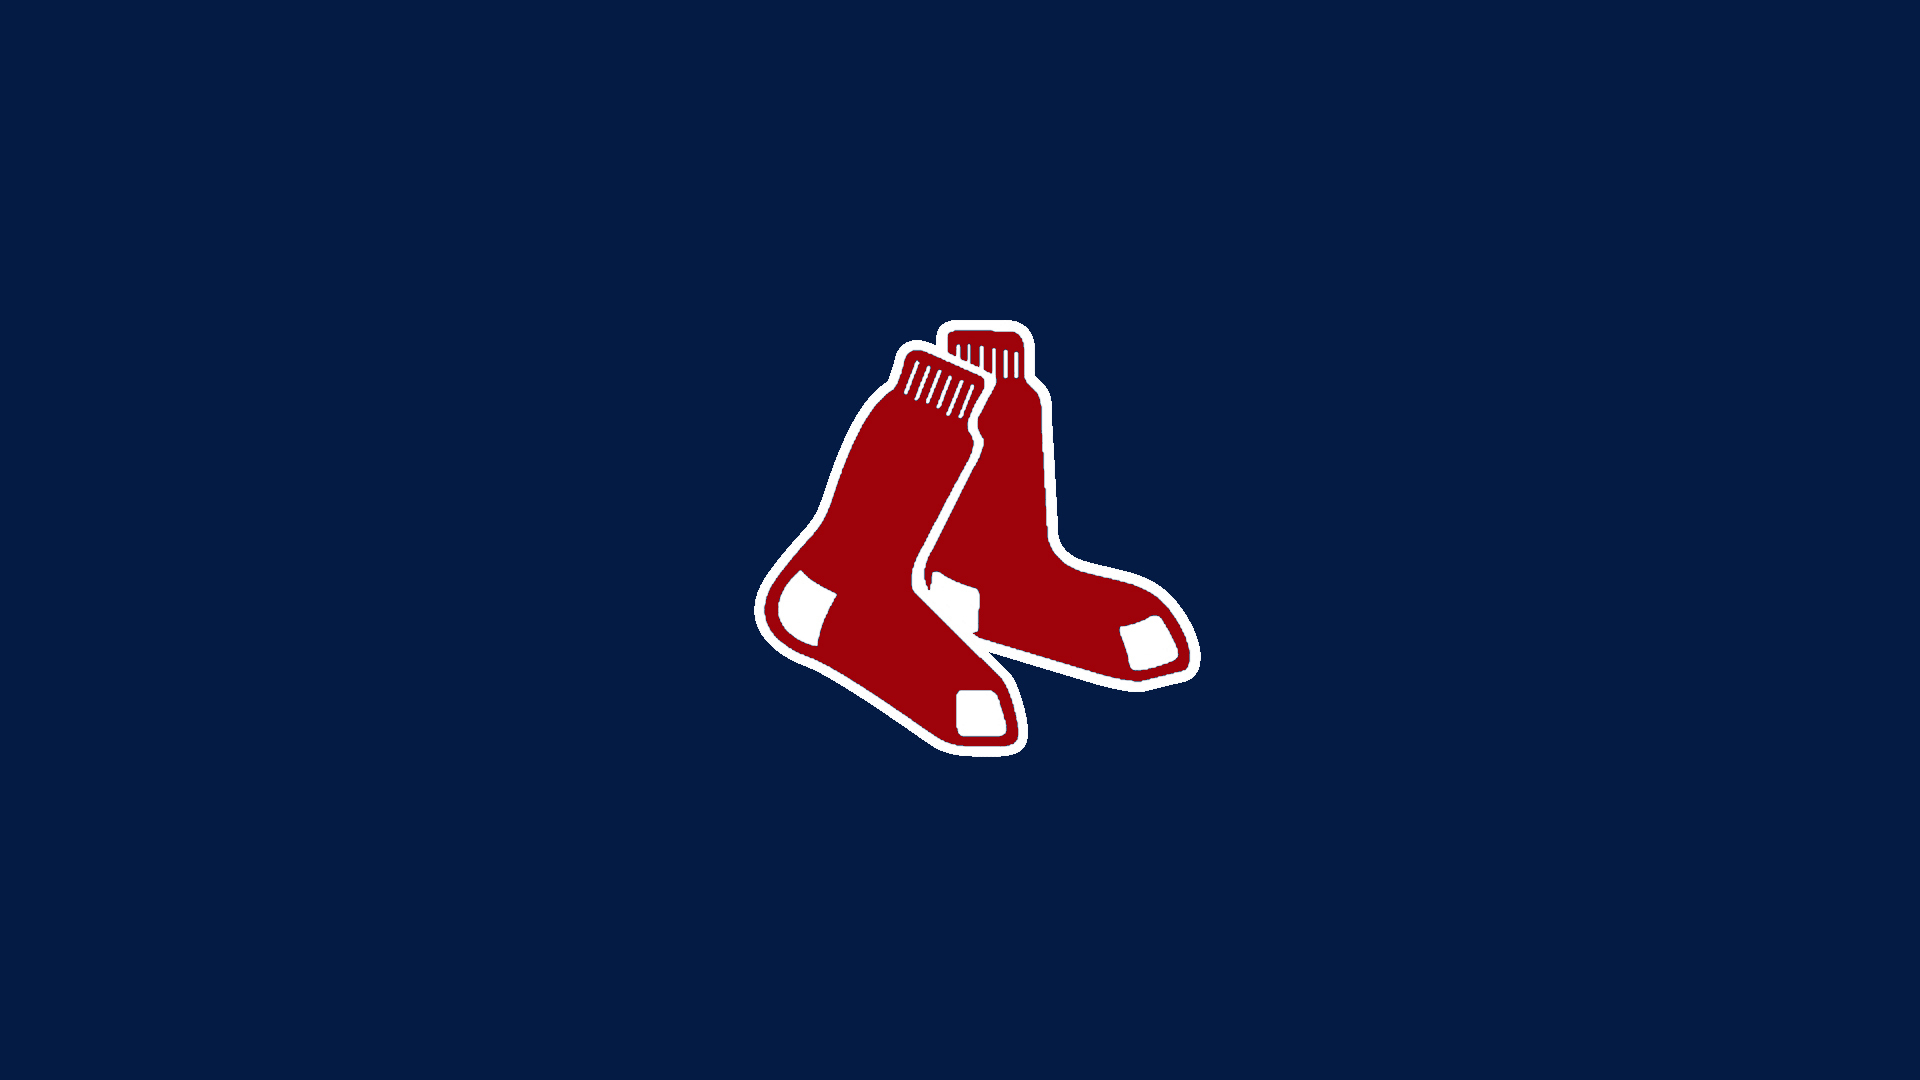 Red Sox Wallpaper 8597 1920x1080px 1920x1080